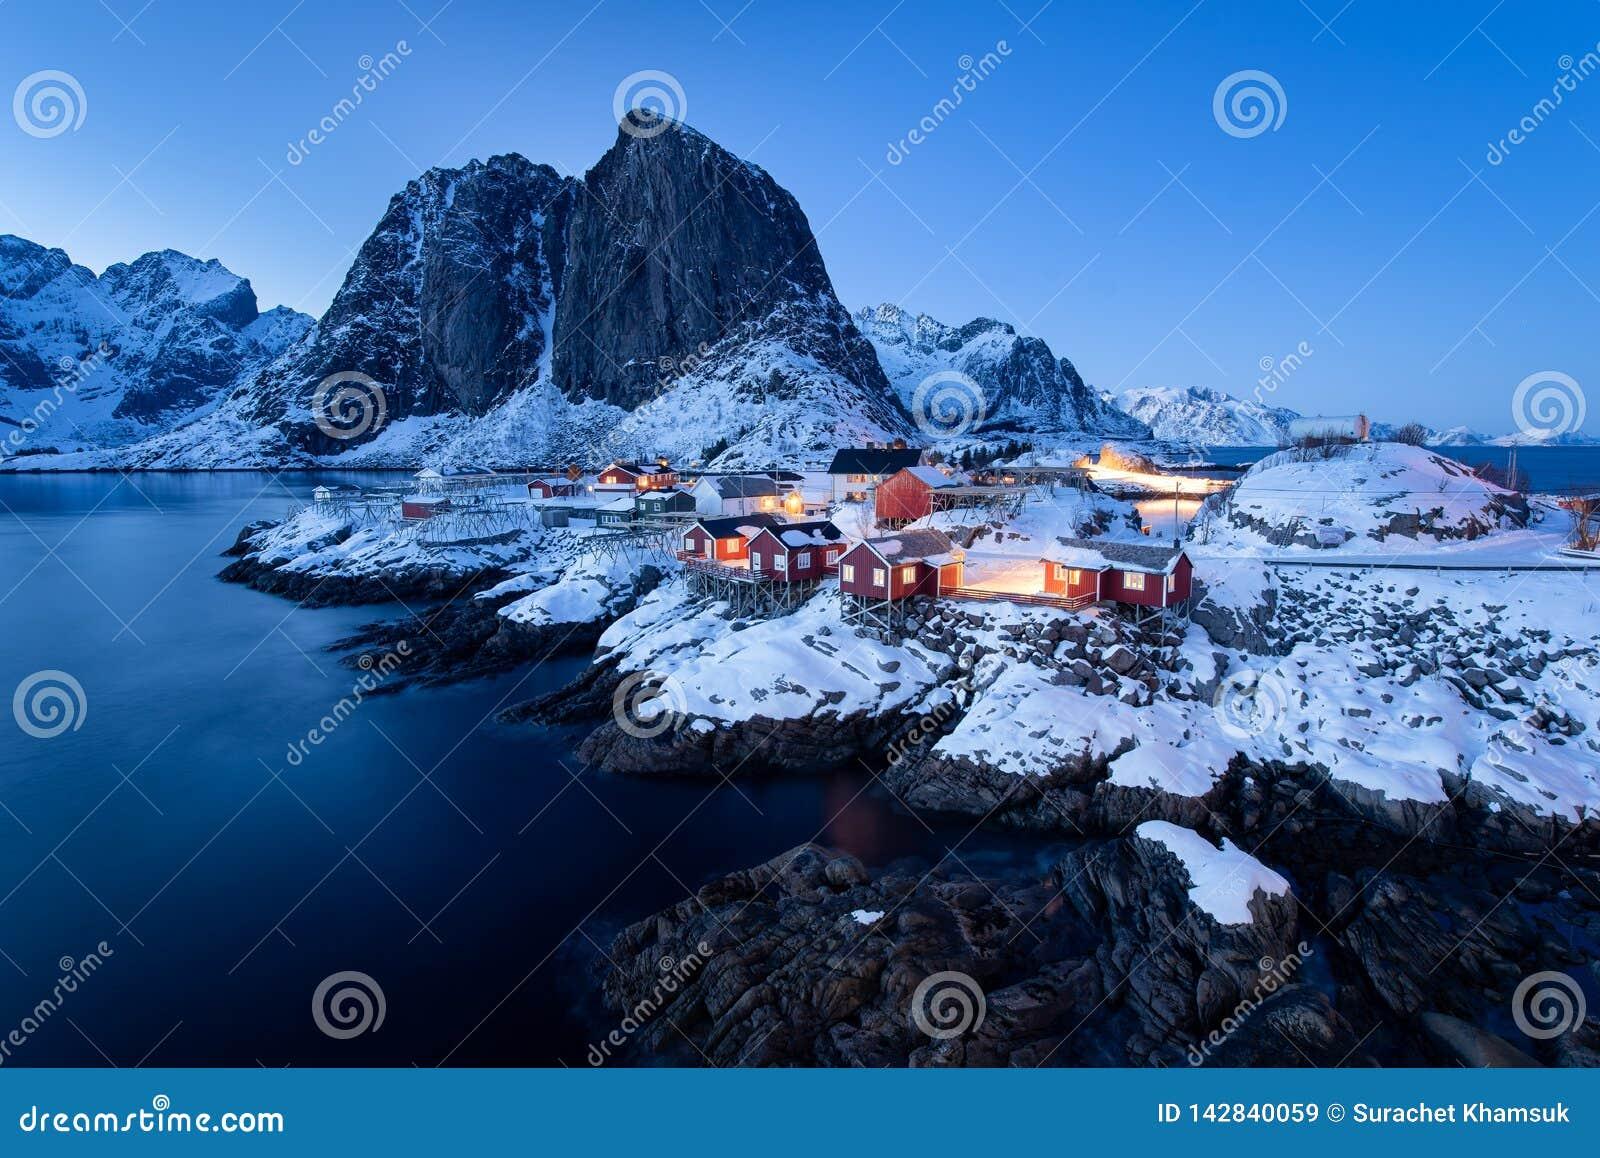 Fishermen's客舱rorbu在微明的Hamnoy村庄在冬天季节,罗弗敦群岛海岛,挪威